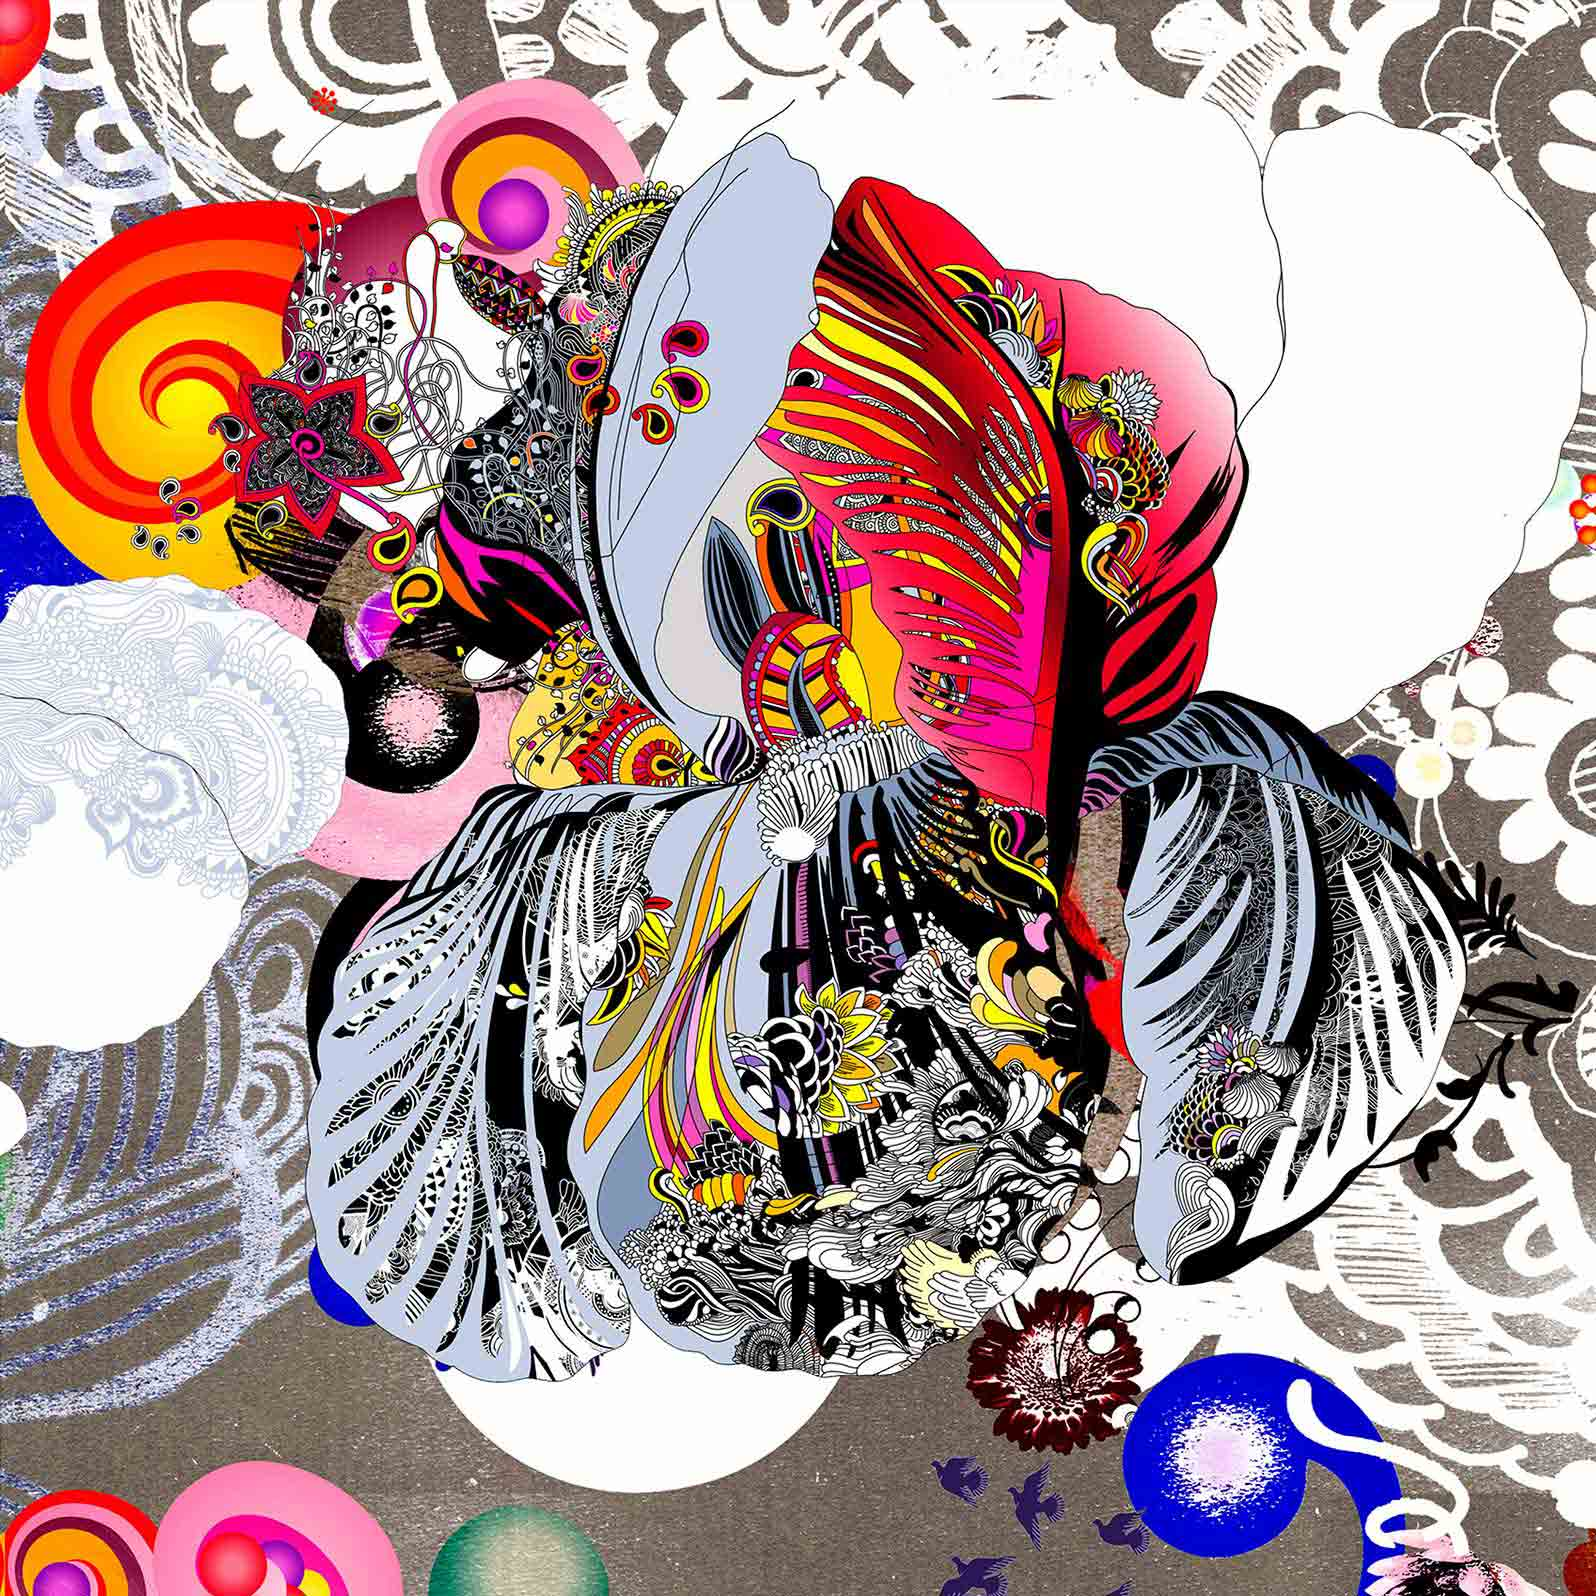 Anca Stefanescu | Hamatreya Digital Art, Limited Edition Print On Canvas